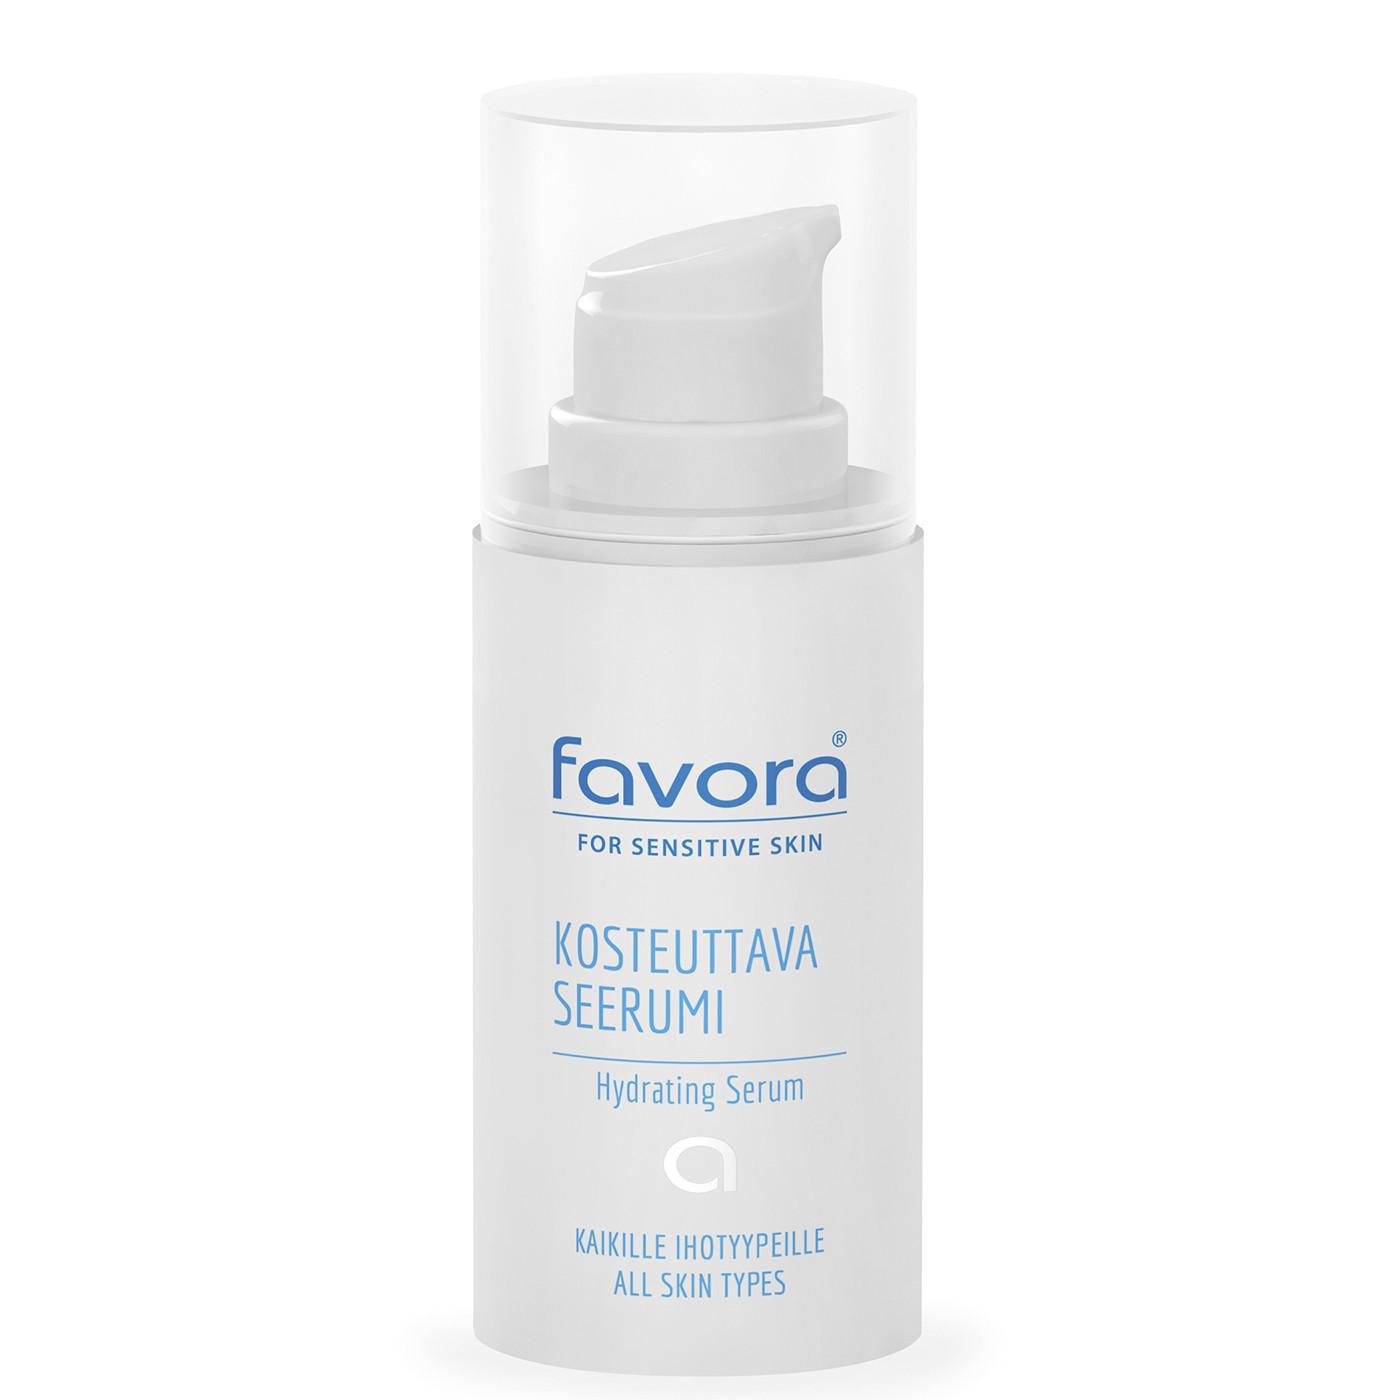 Favora Kosteuttava Seerumi Hydrating Serum